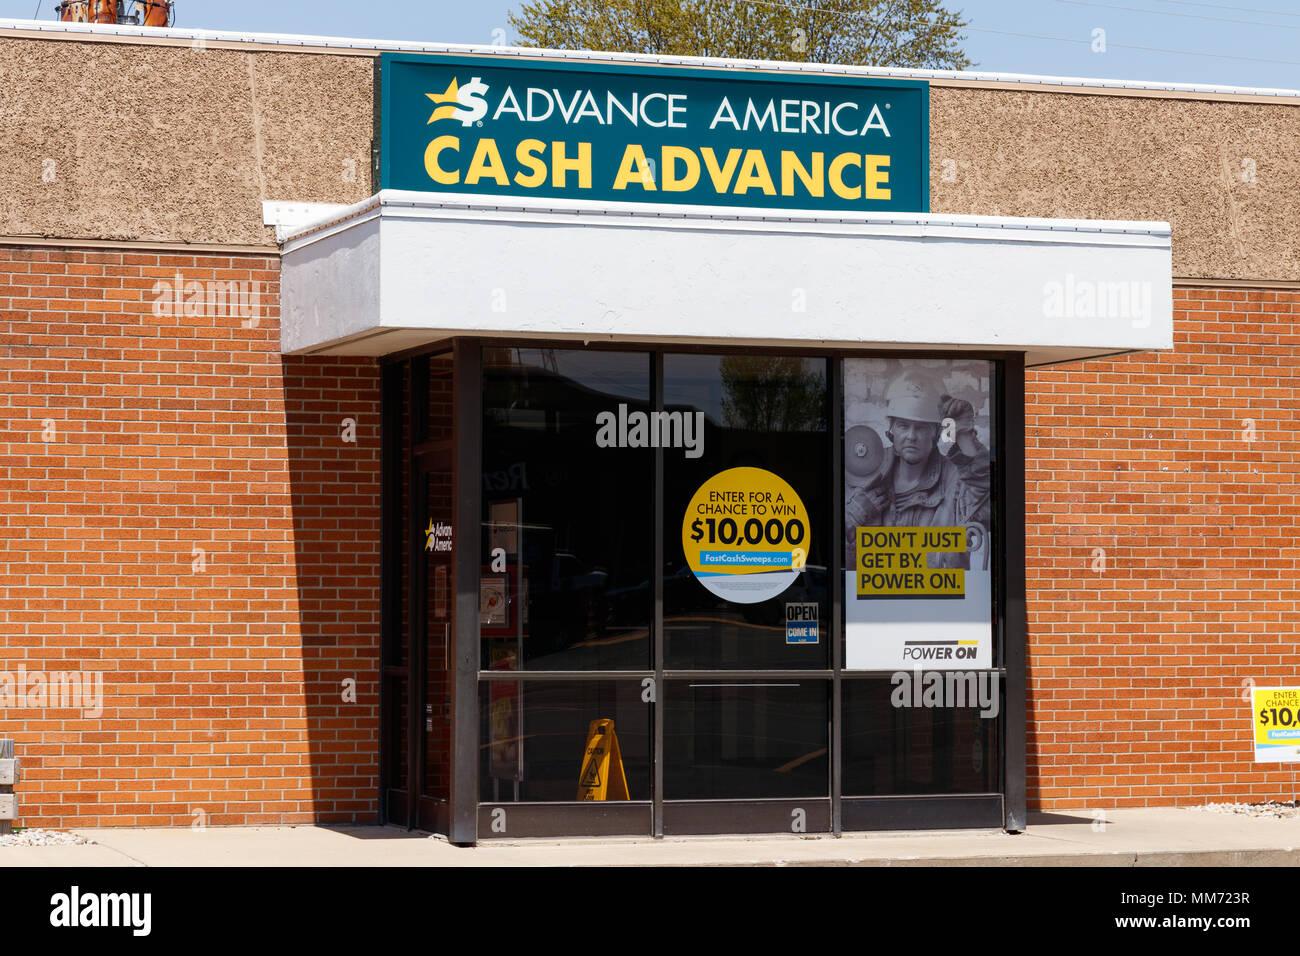 National cash advance dover ohio image 10